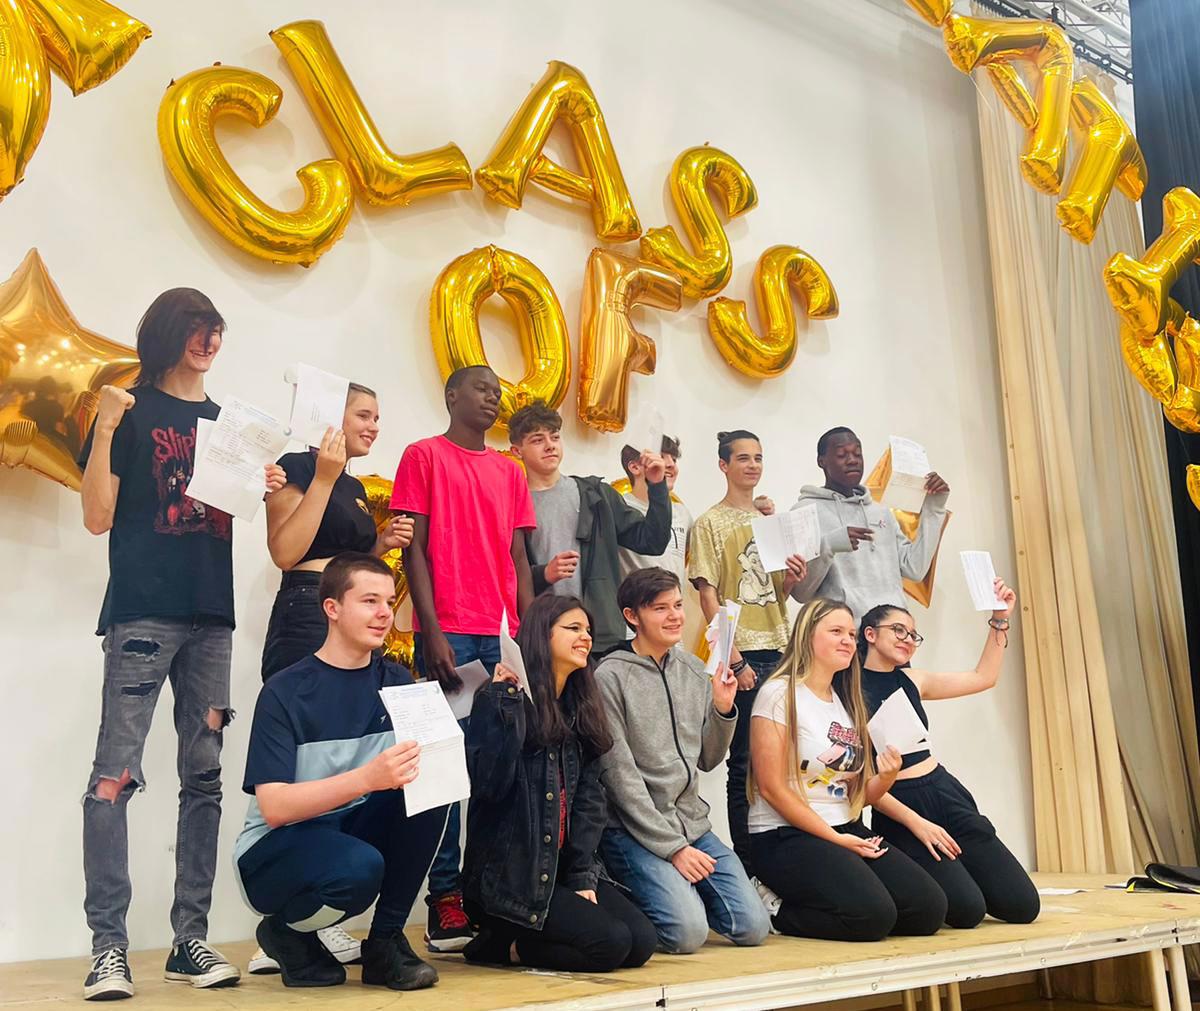 Students celebrating GCSE Results Day 2021 together